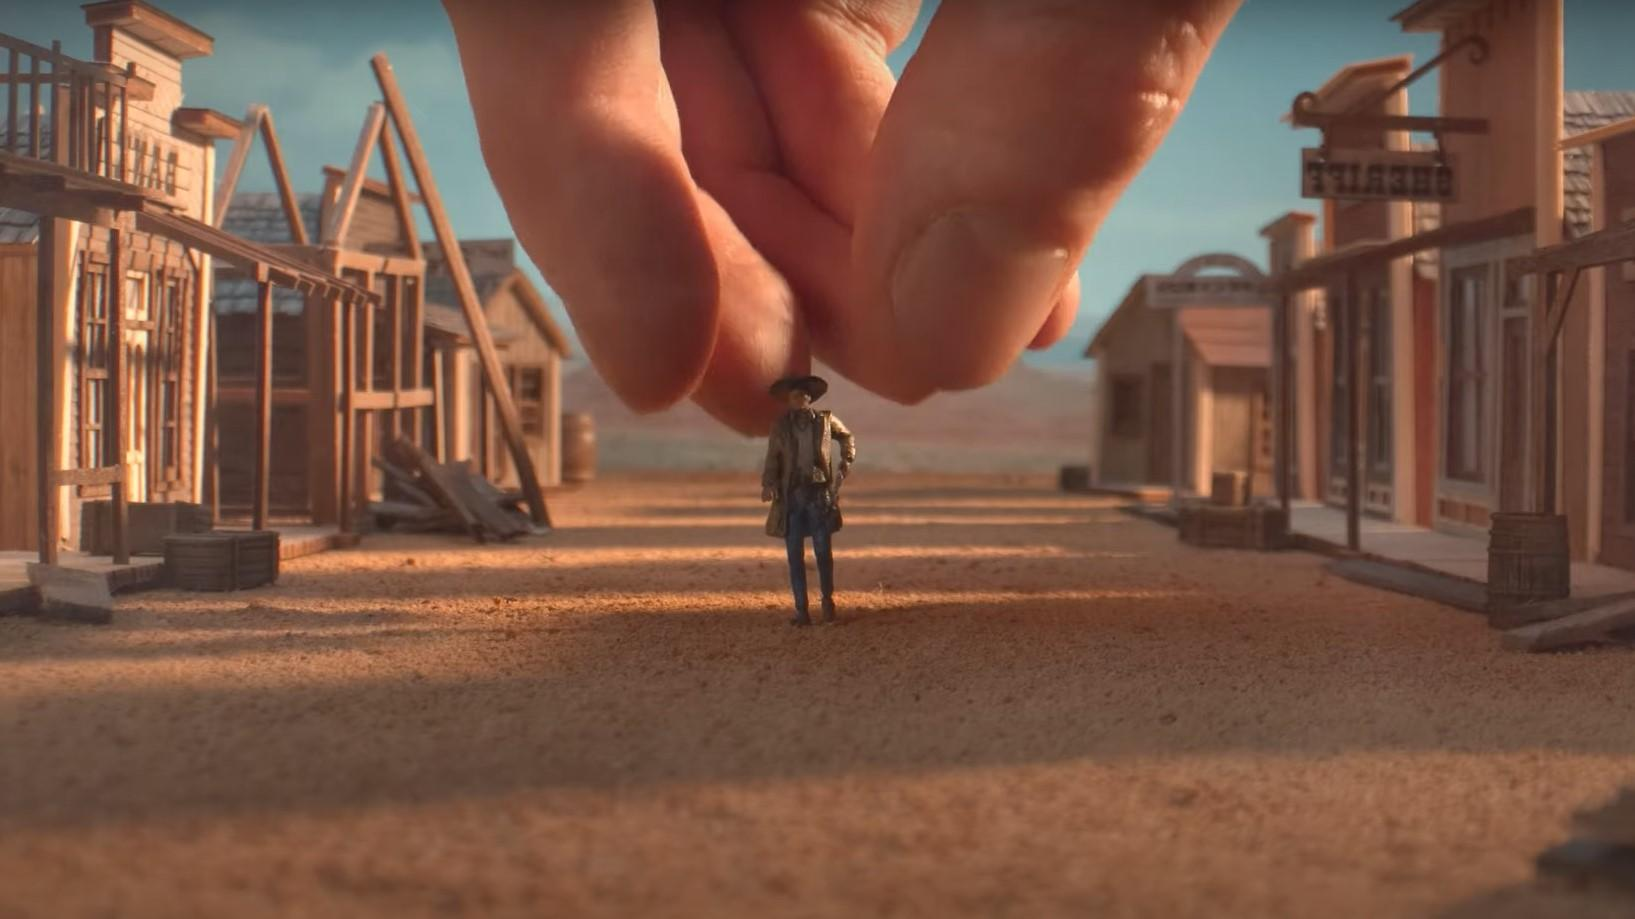 Desperados Iii Trailer Recreates The Game In Miniature Xbox One Xbox 360 News At Xboxachievements Com